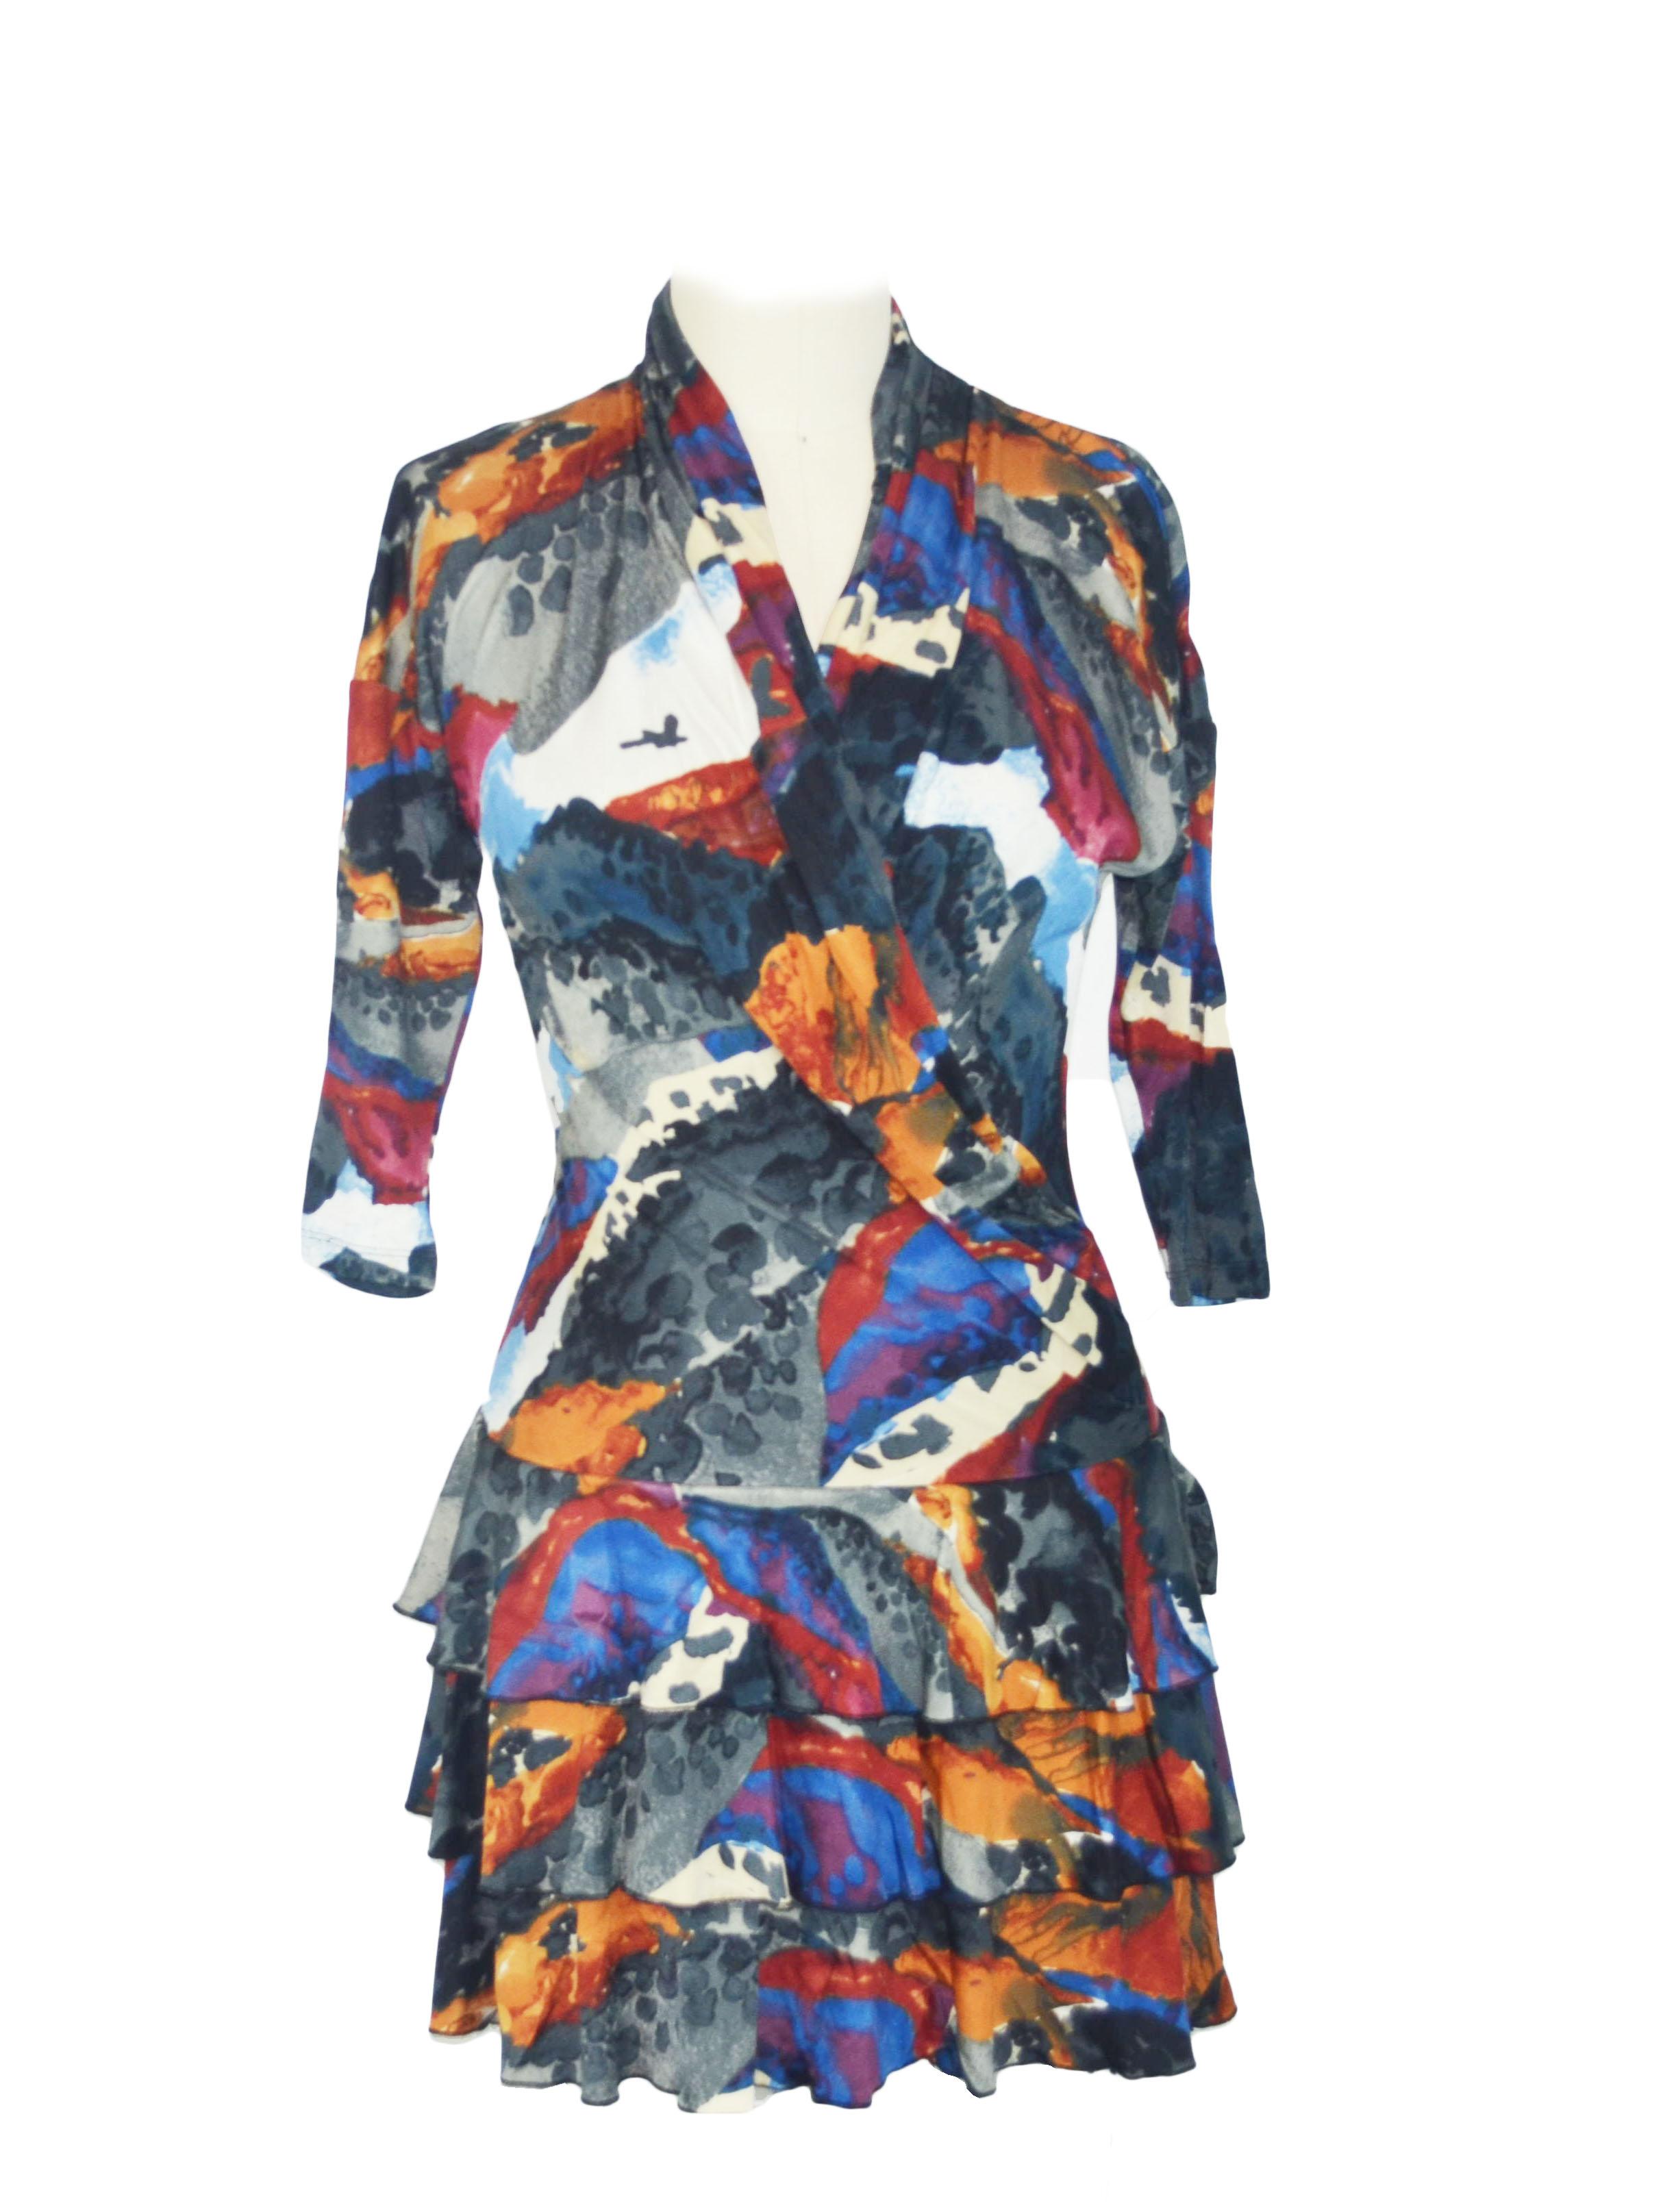 Water color wrap dress